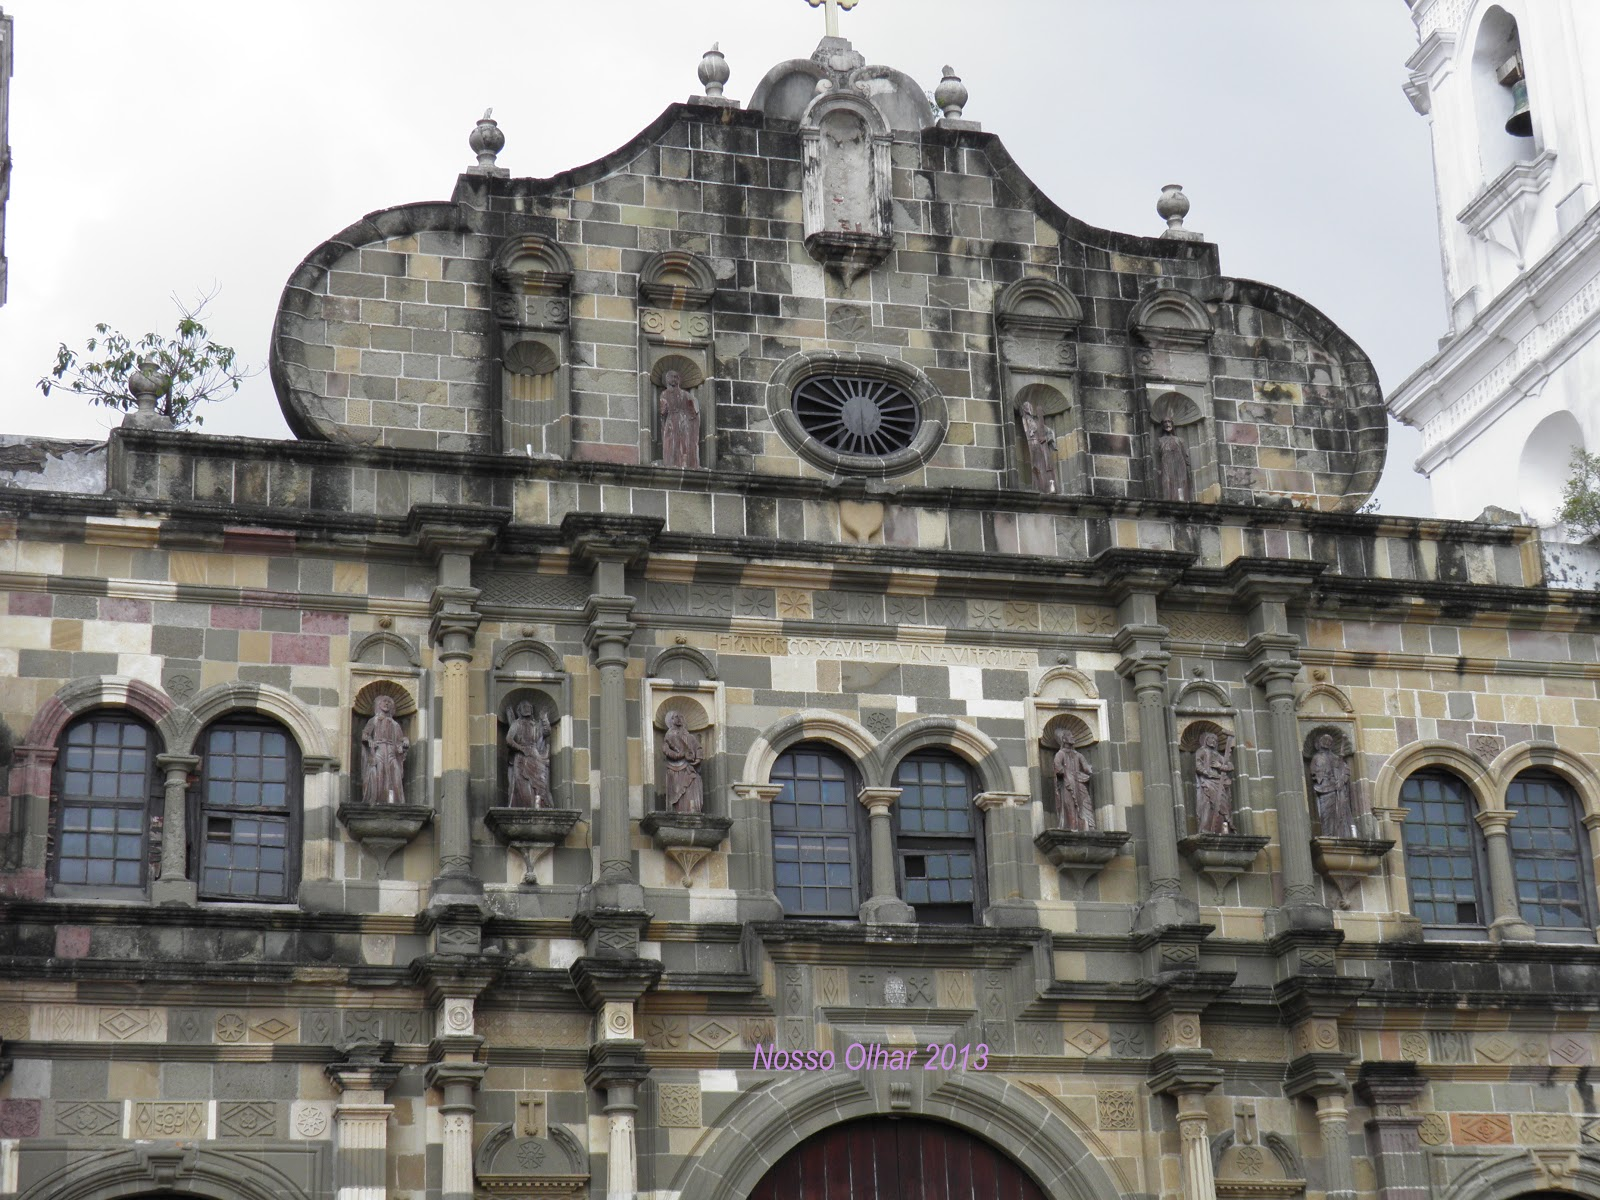 NOSSO OLHAR: Panamá- Casco Viejo / Panamá - Old Town